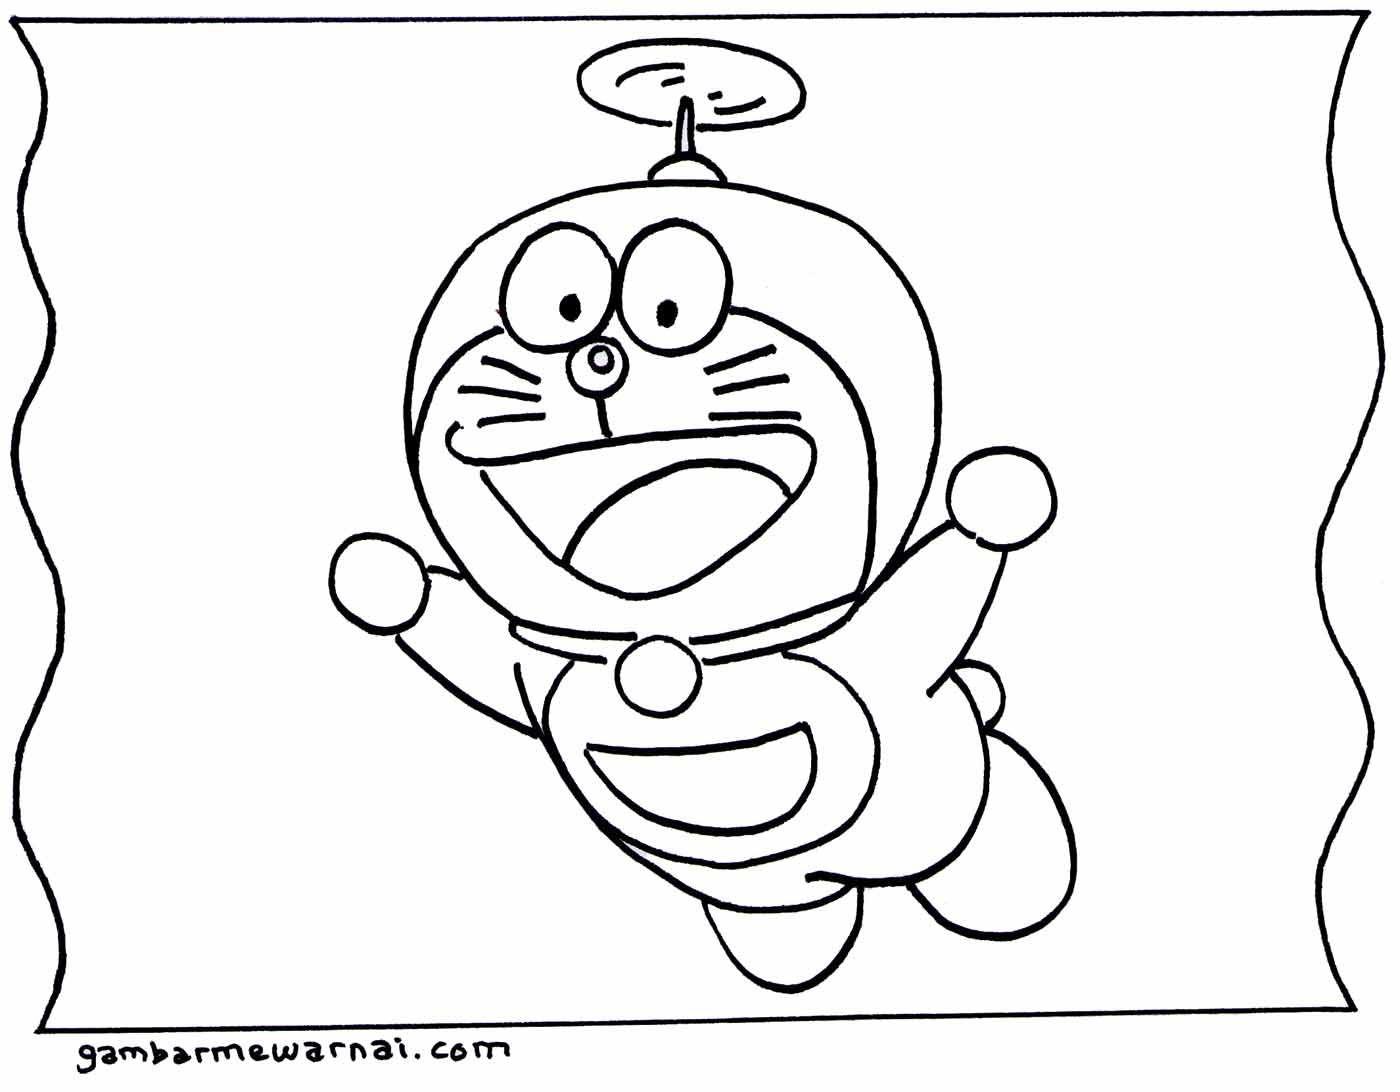 ✓ Terbaru Sketsa Gambar Kartun Doraemon Hitam Putih